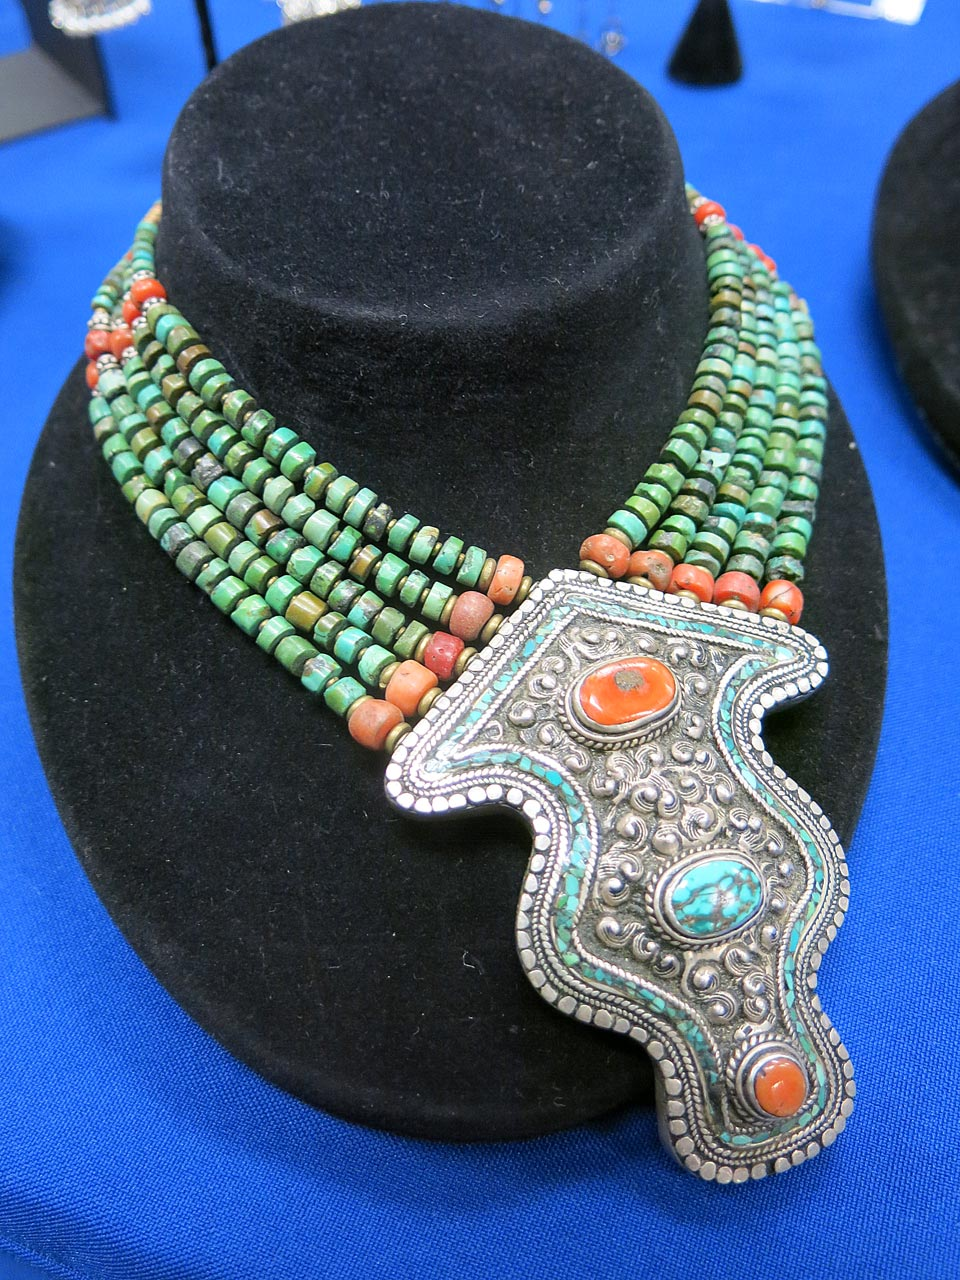 Antique silver pendant, which shows Tibetan influences.